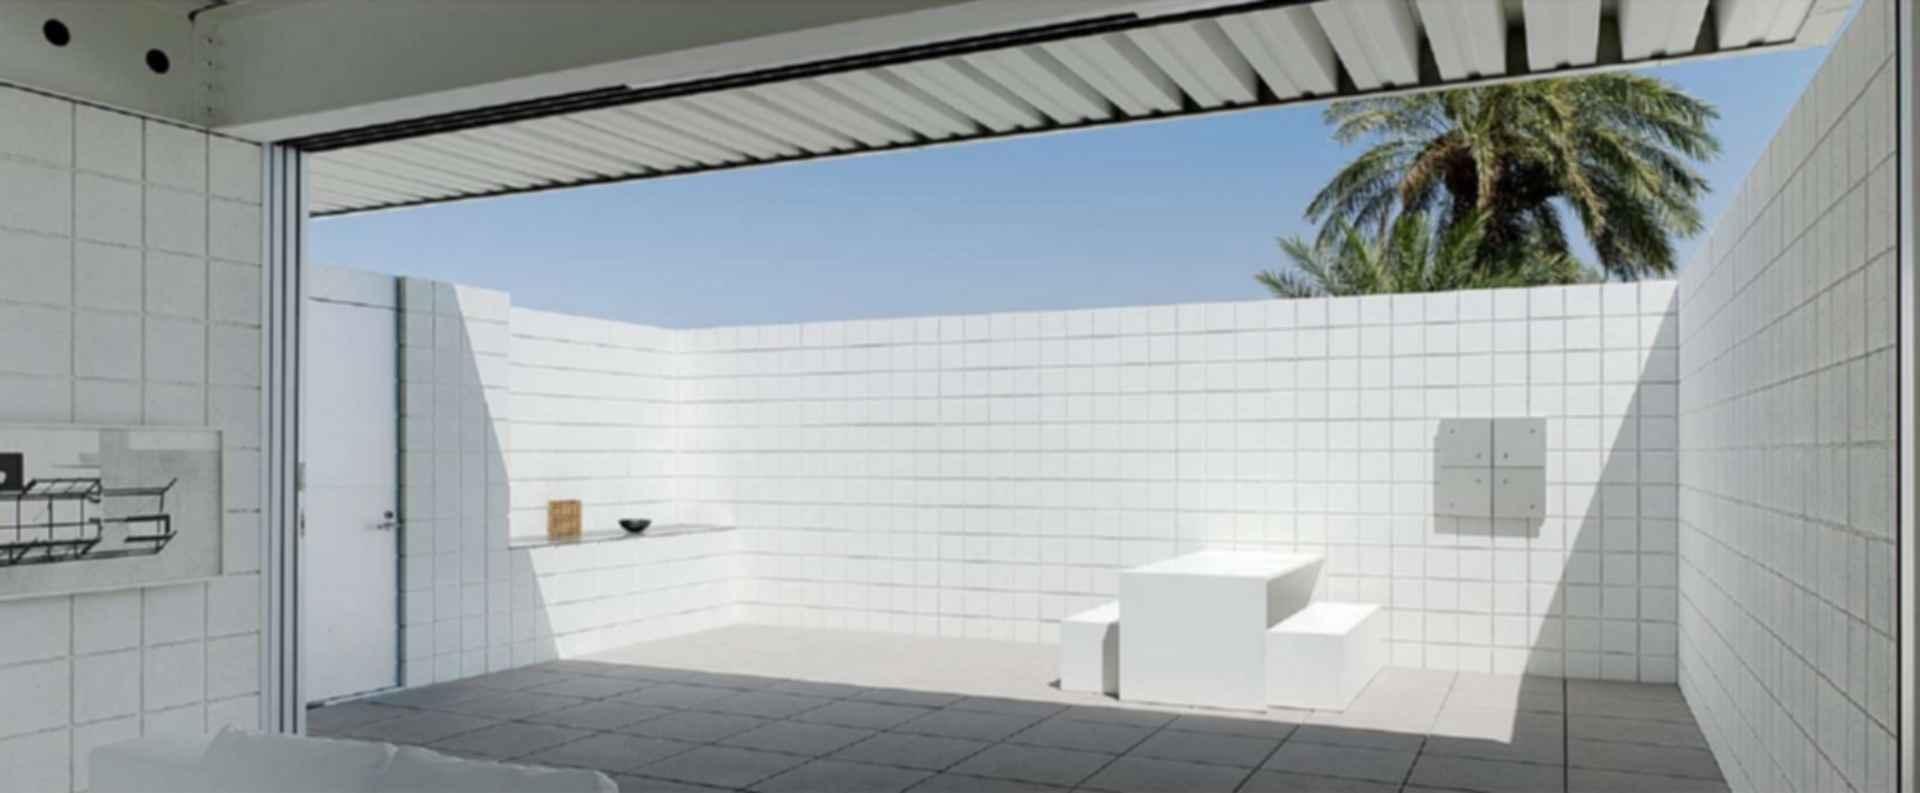 Desert House - exterior/patio